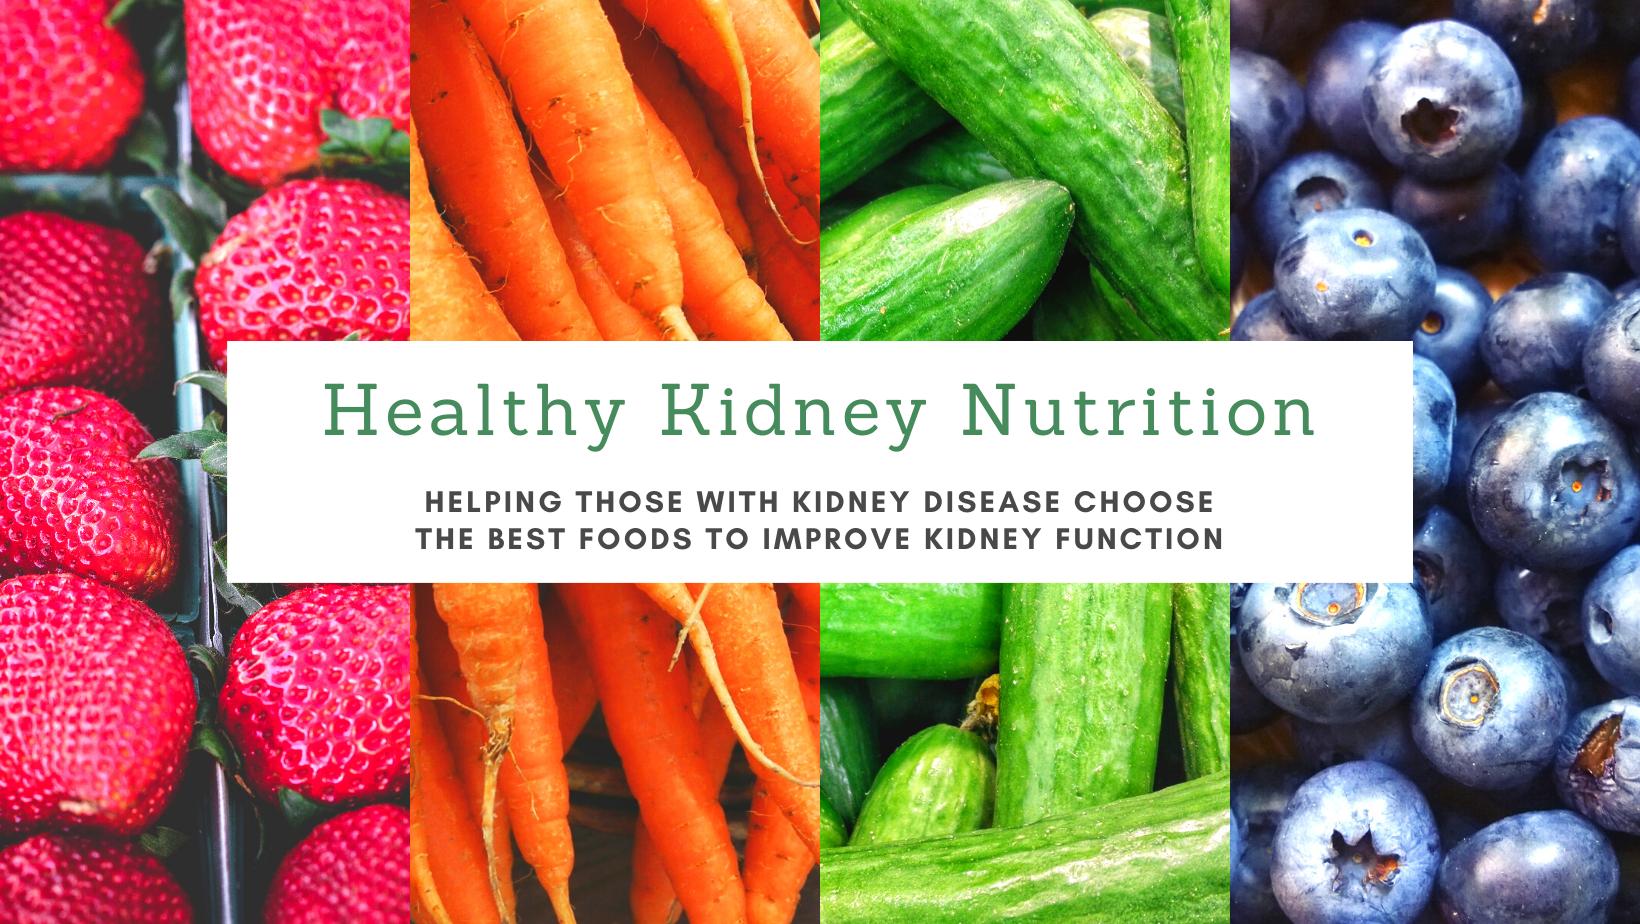 Healthy Kidney Nutrition